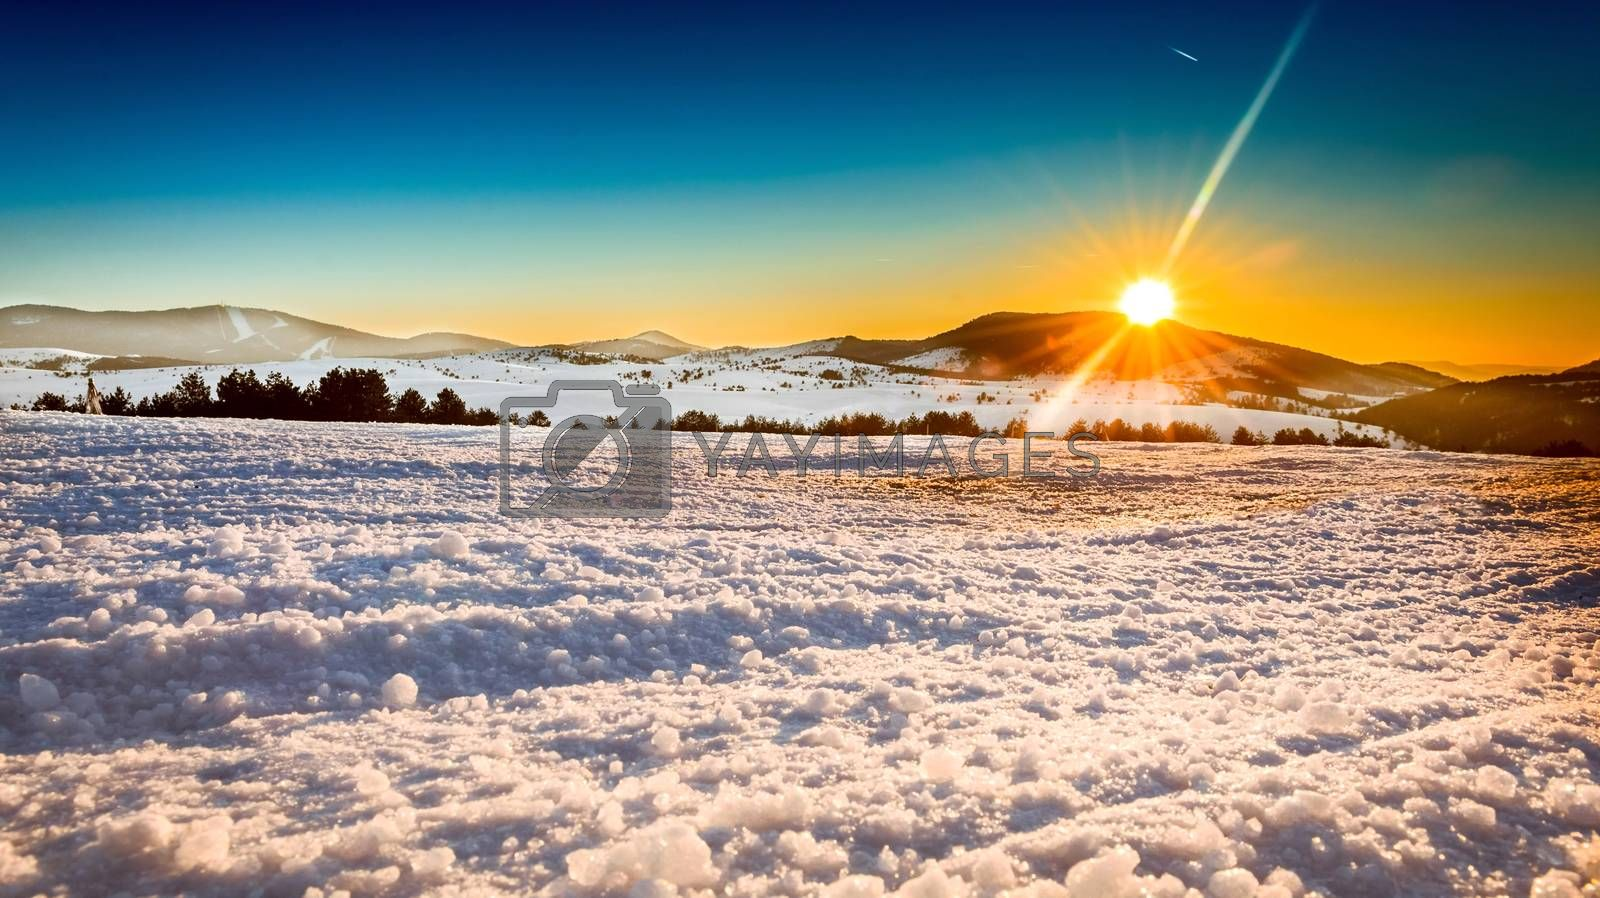 Beautiful Winter Landscape with sunset